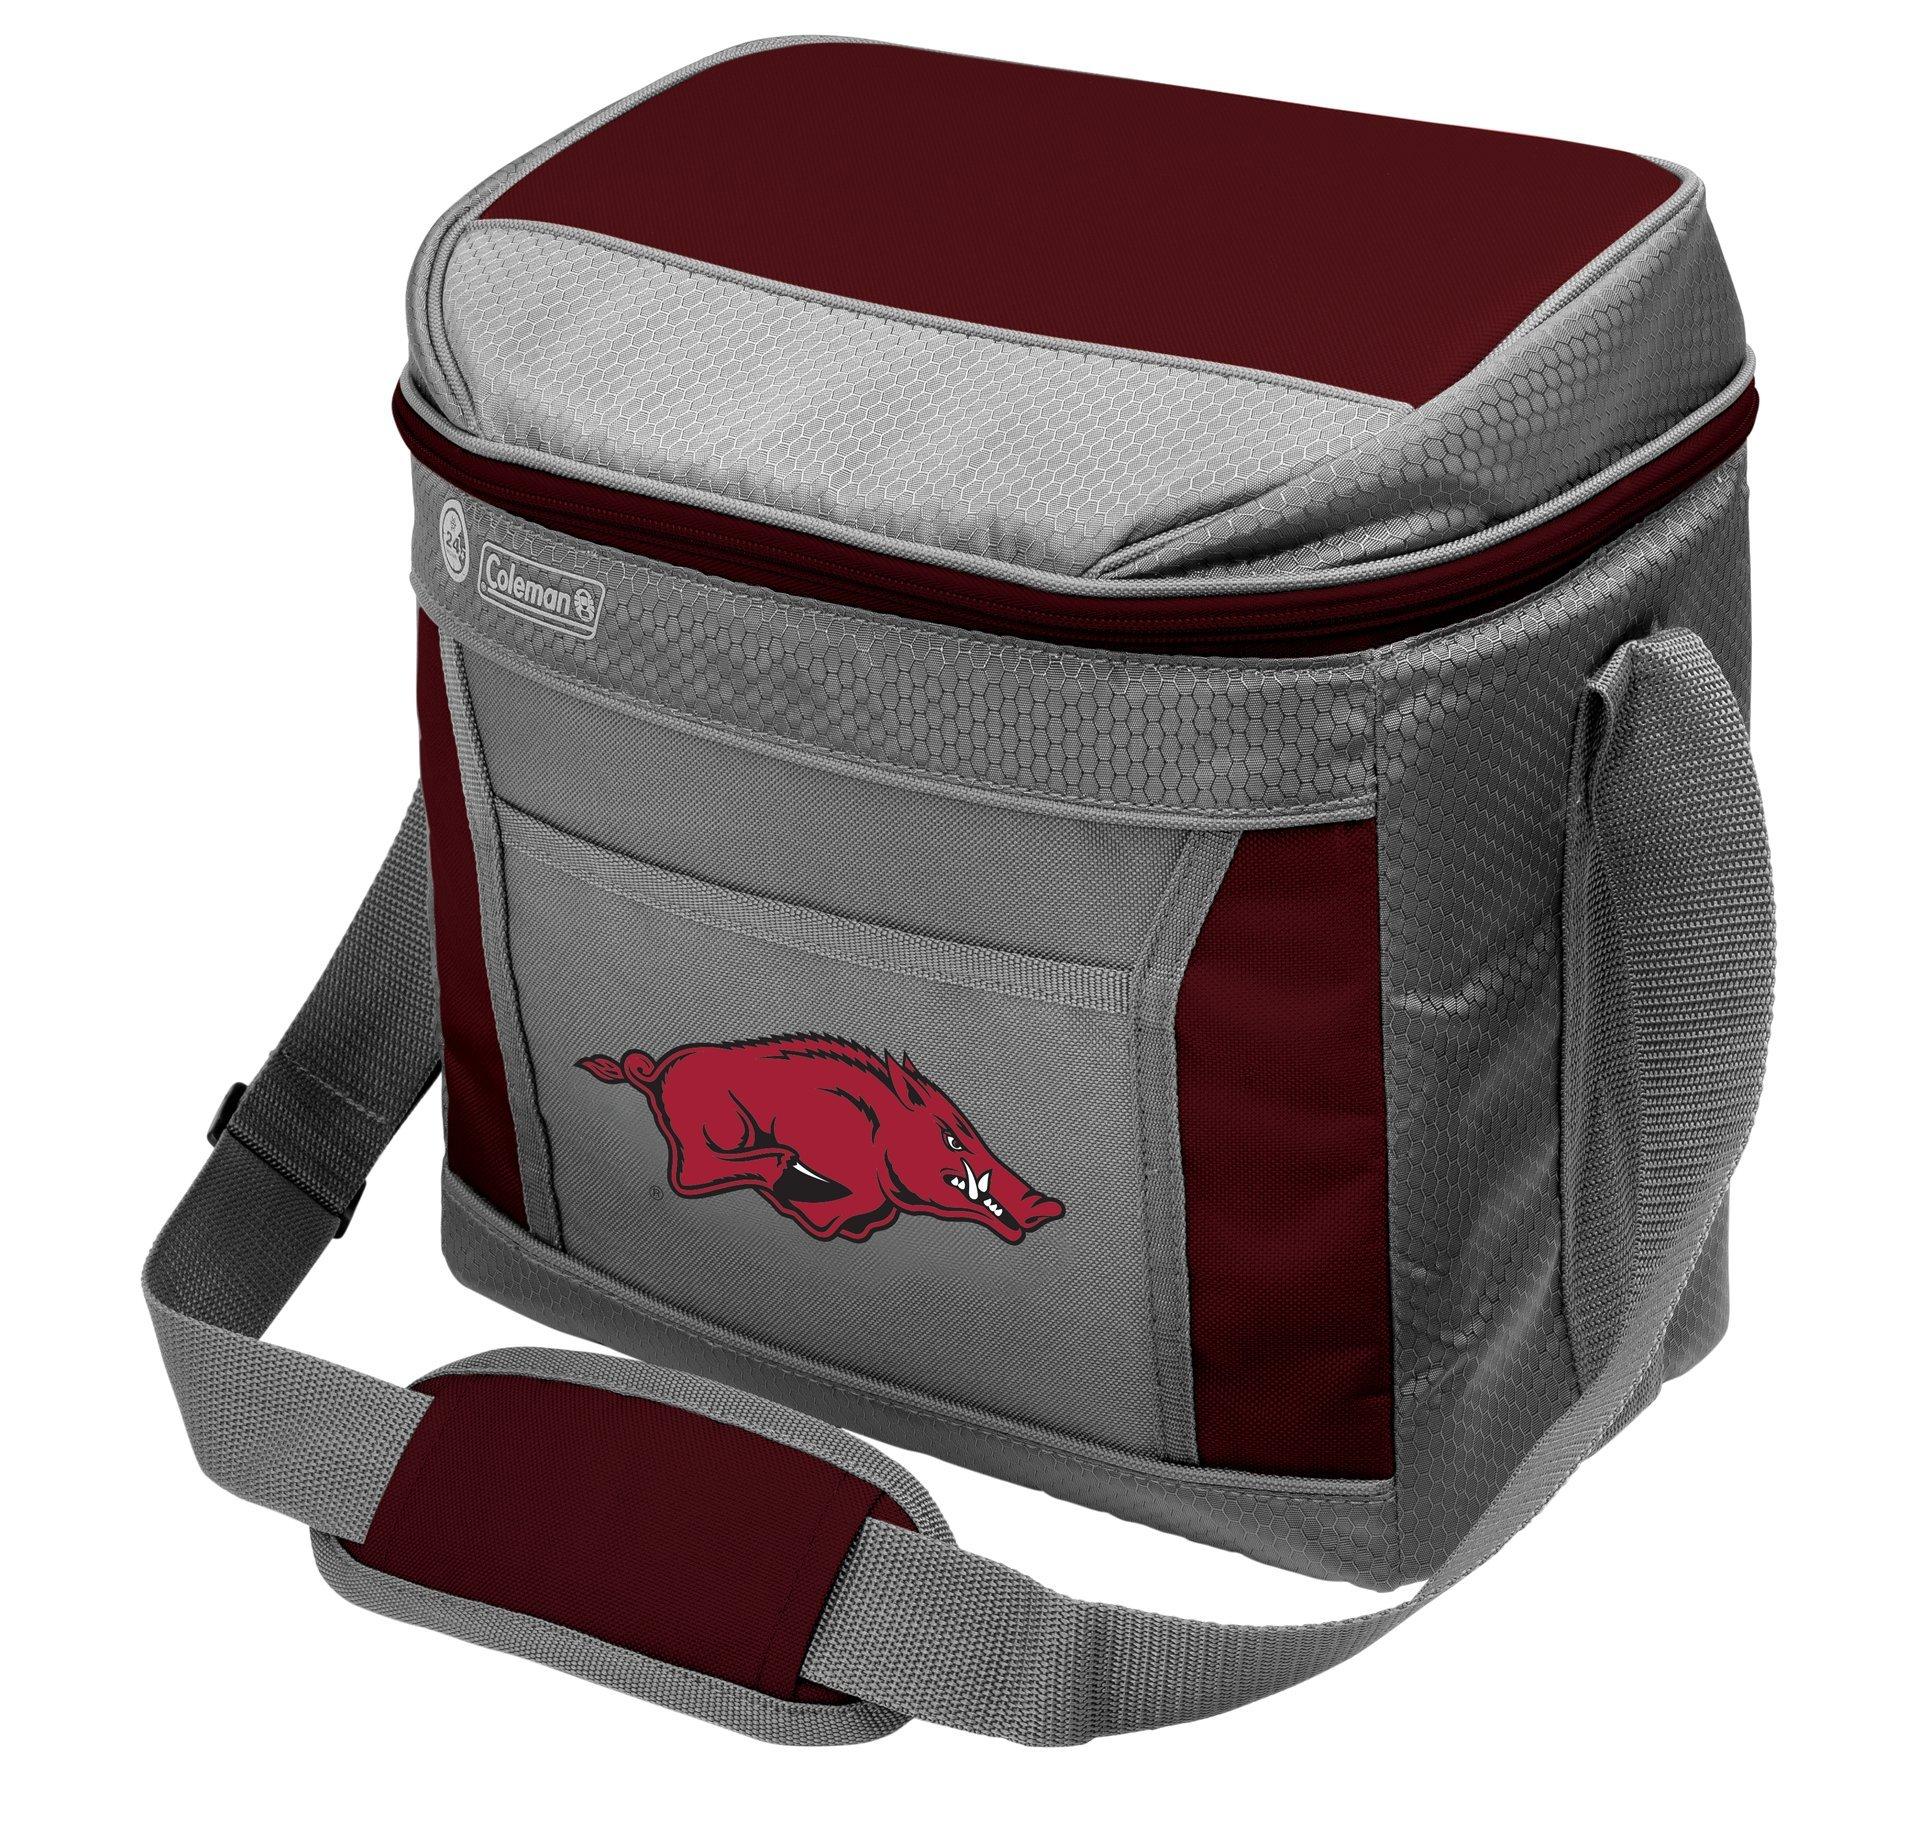 Coleman NCAA Soft-Sided Insulated Cooler Bag, 16-Can Capacity, Arkansas Razorbacks